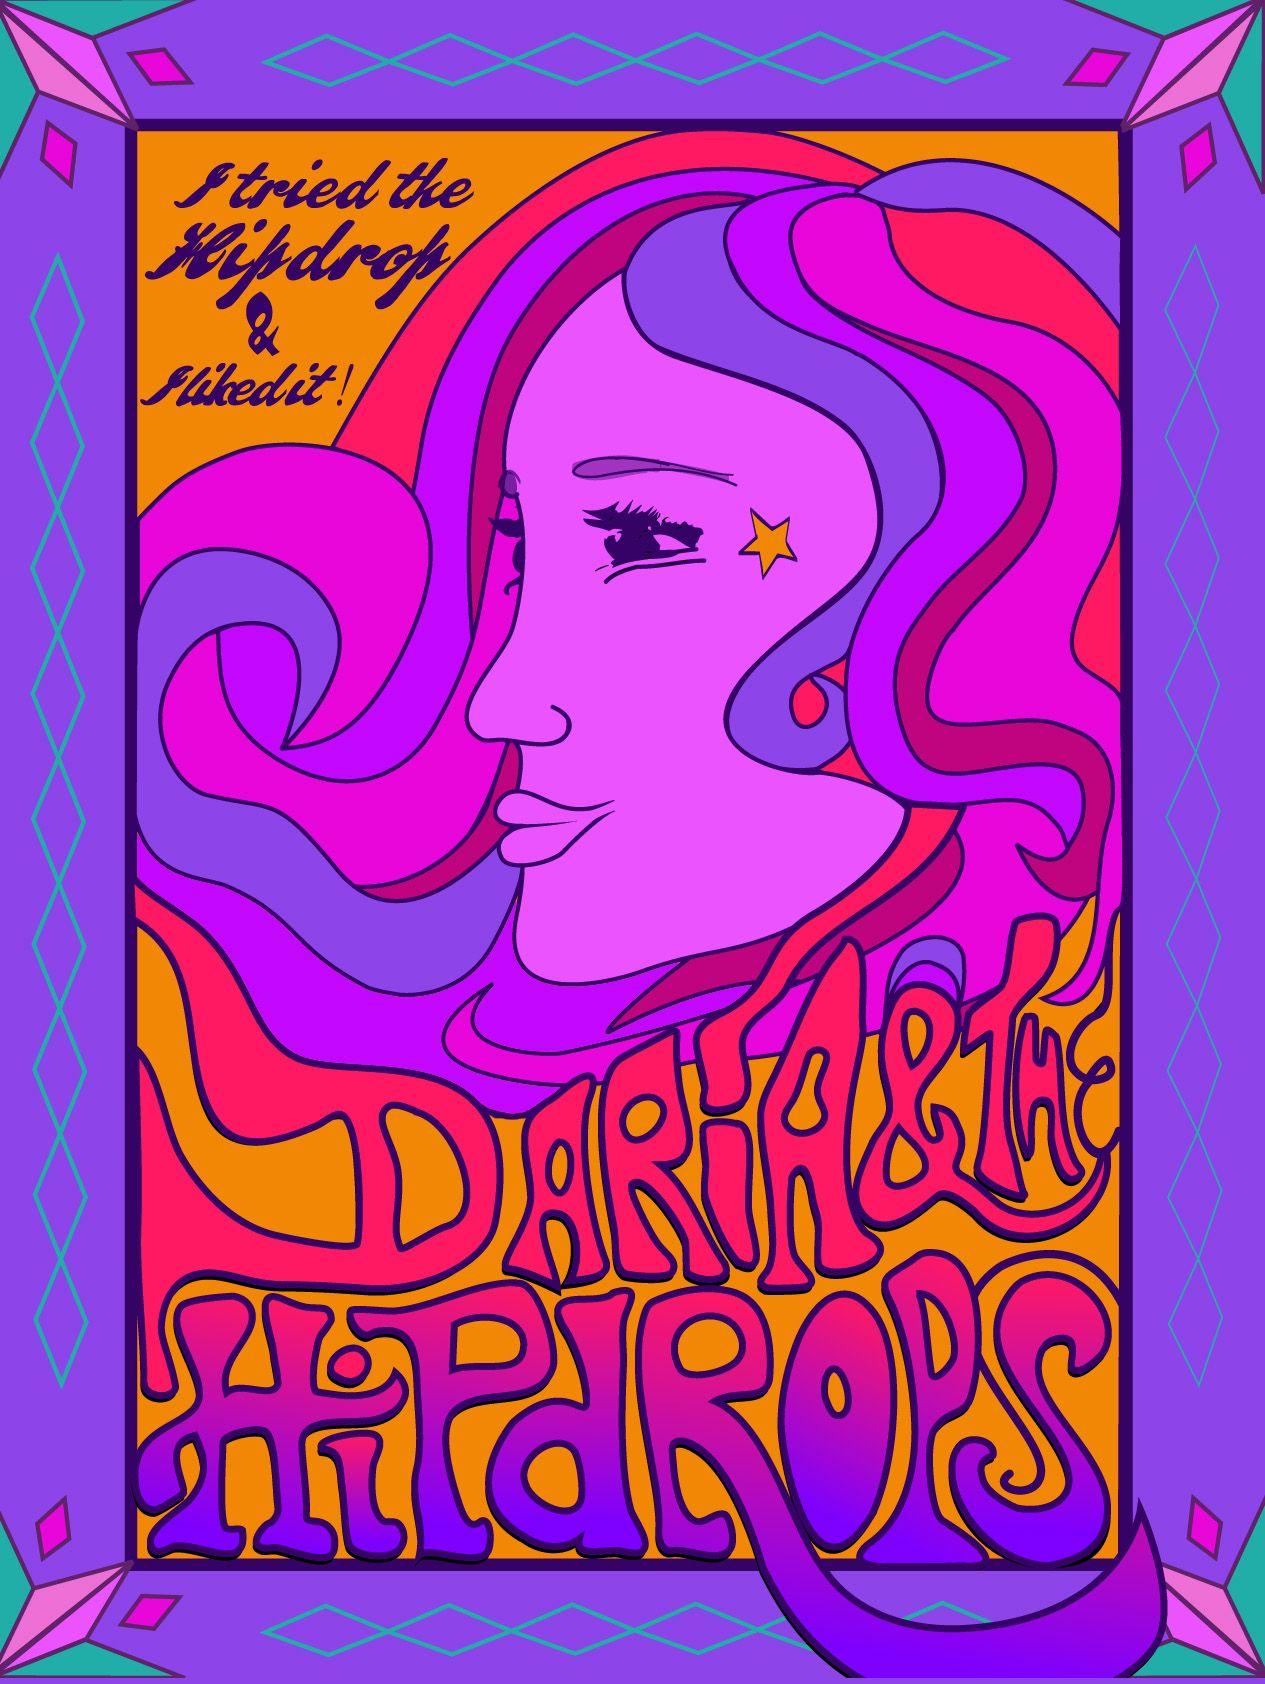 Daria & The Hip Drops sticker, retro funk | album art